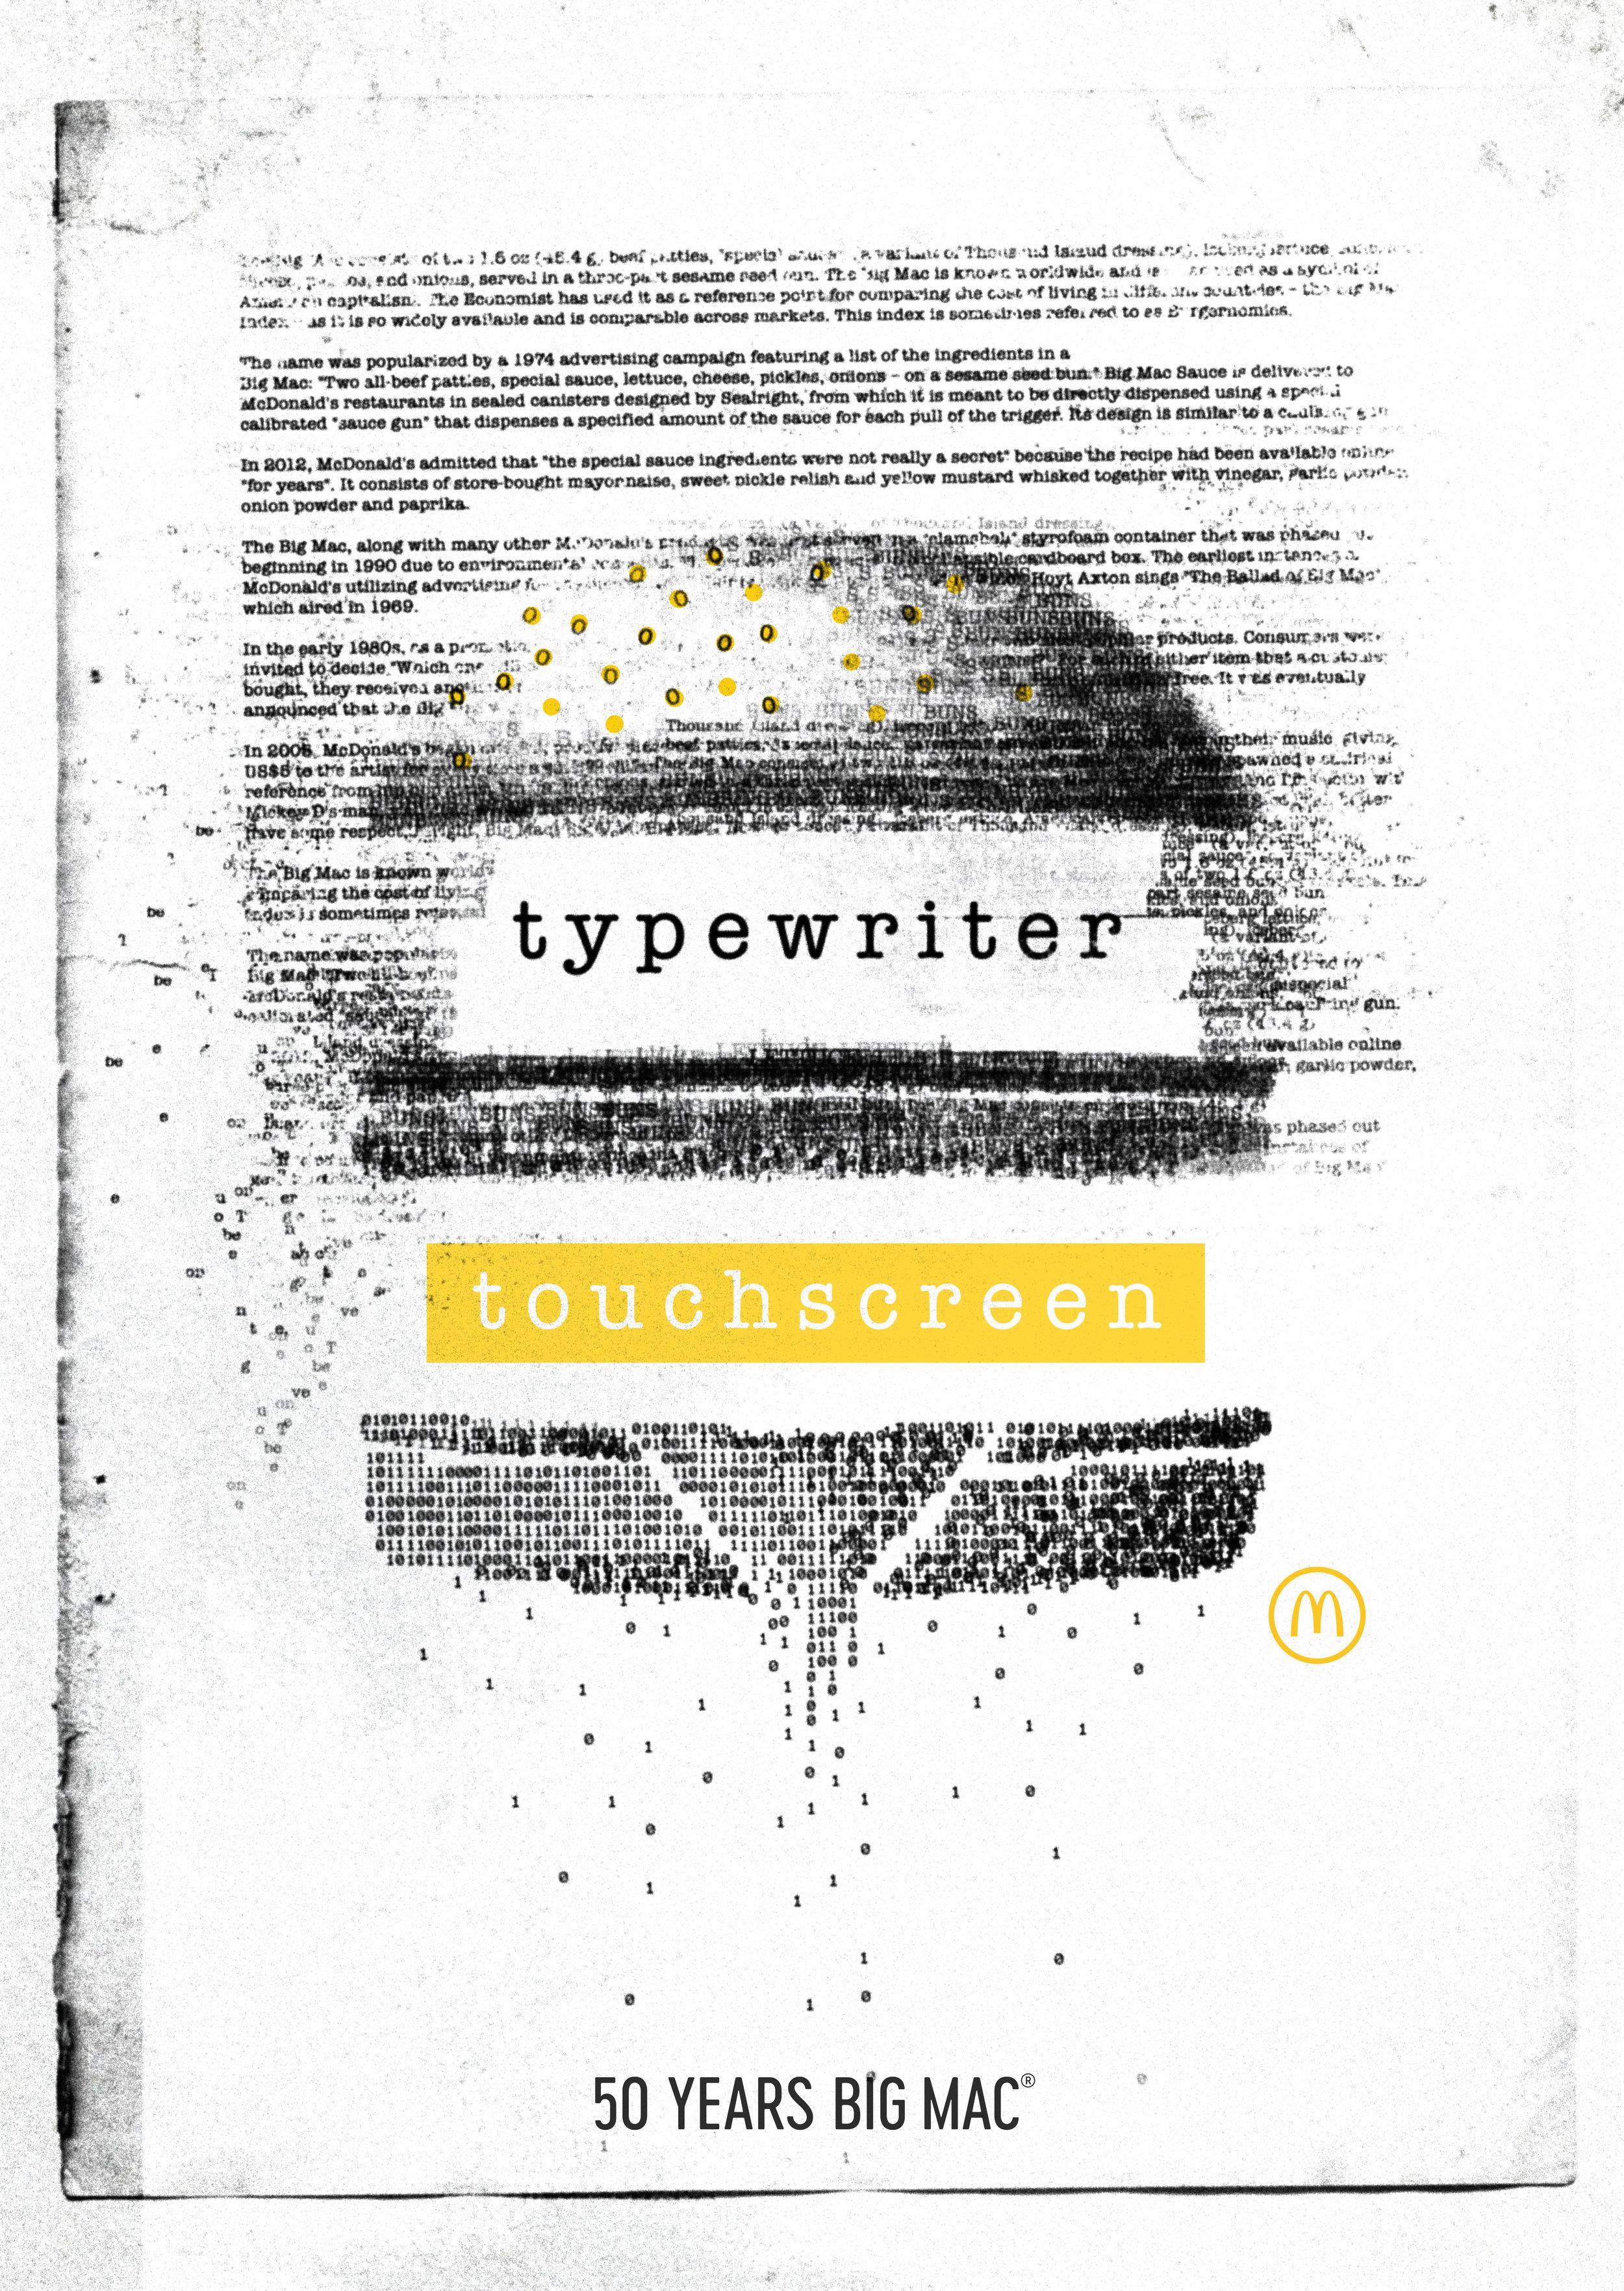 46_Typwriter:Touchscreen.jpg